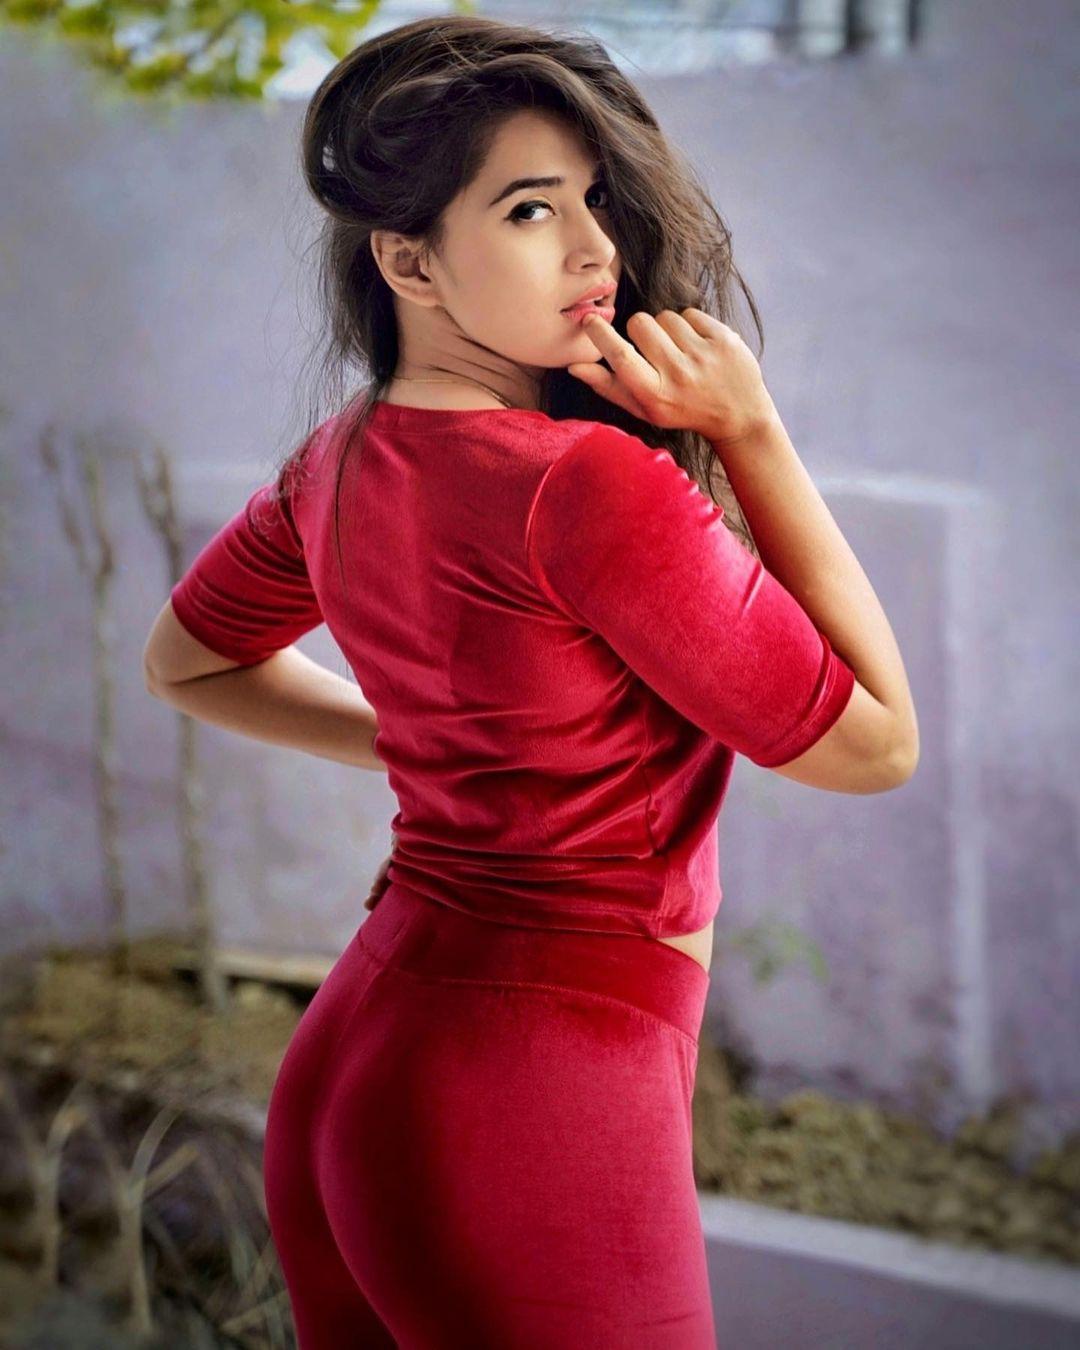 Apoorvaalex Latest Hot Photos - Instagram Model Apoorvaalex